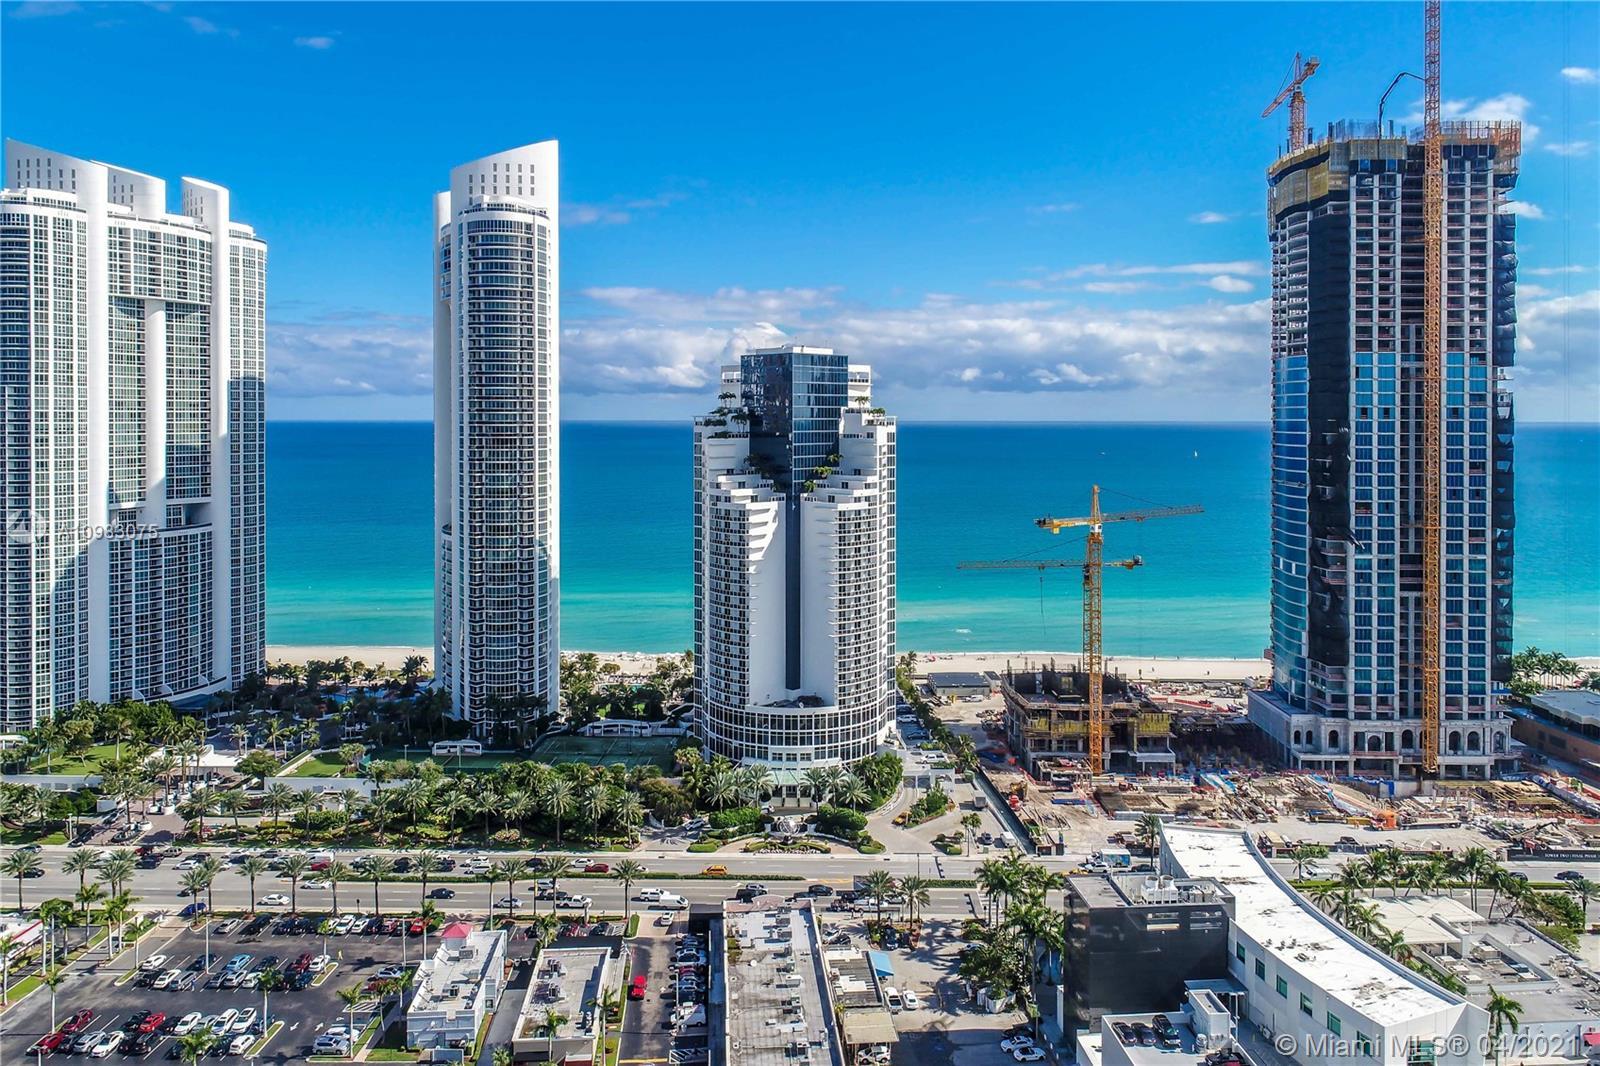 Trump International #802 - 18001 Collins Ave #802, Sunny Isles Beach, FL 33160